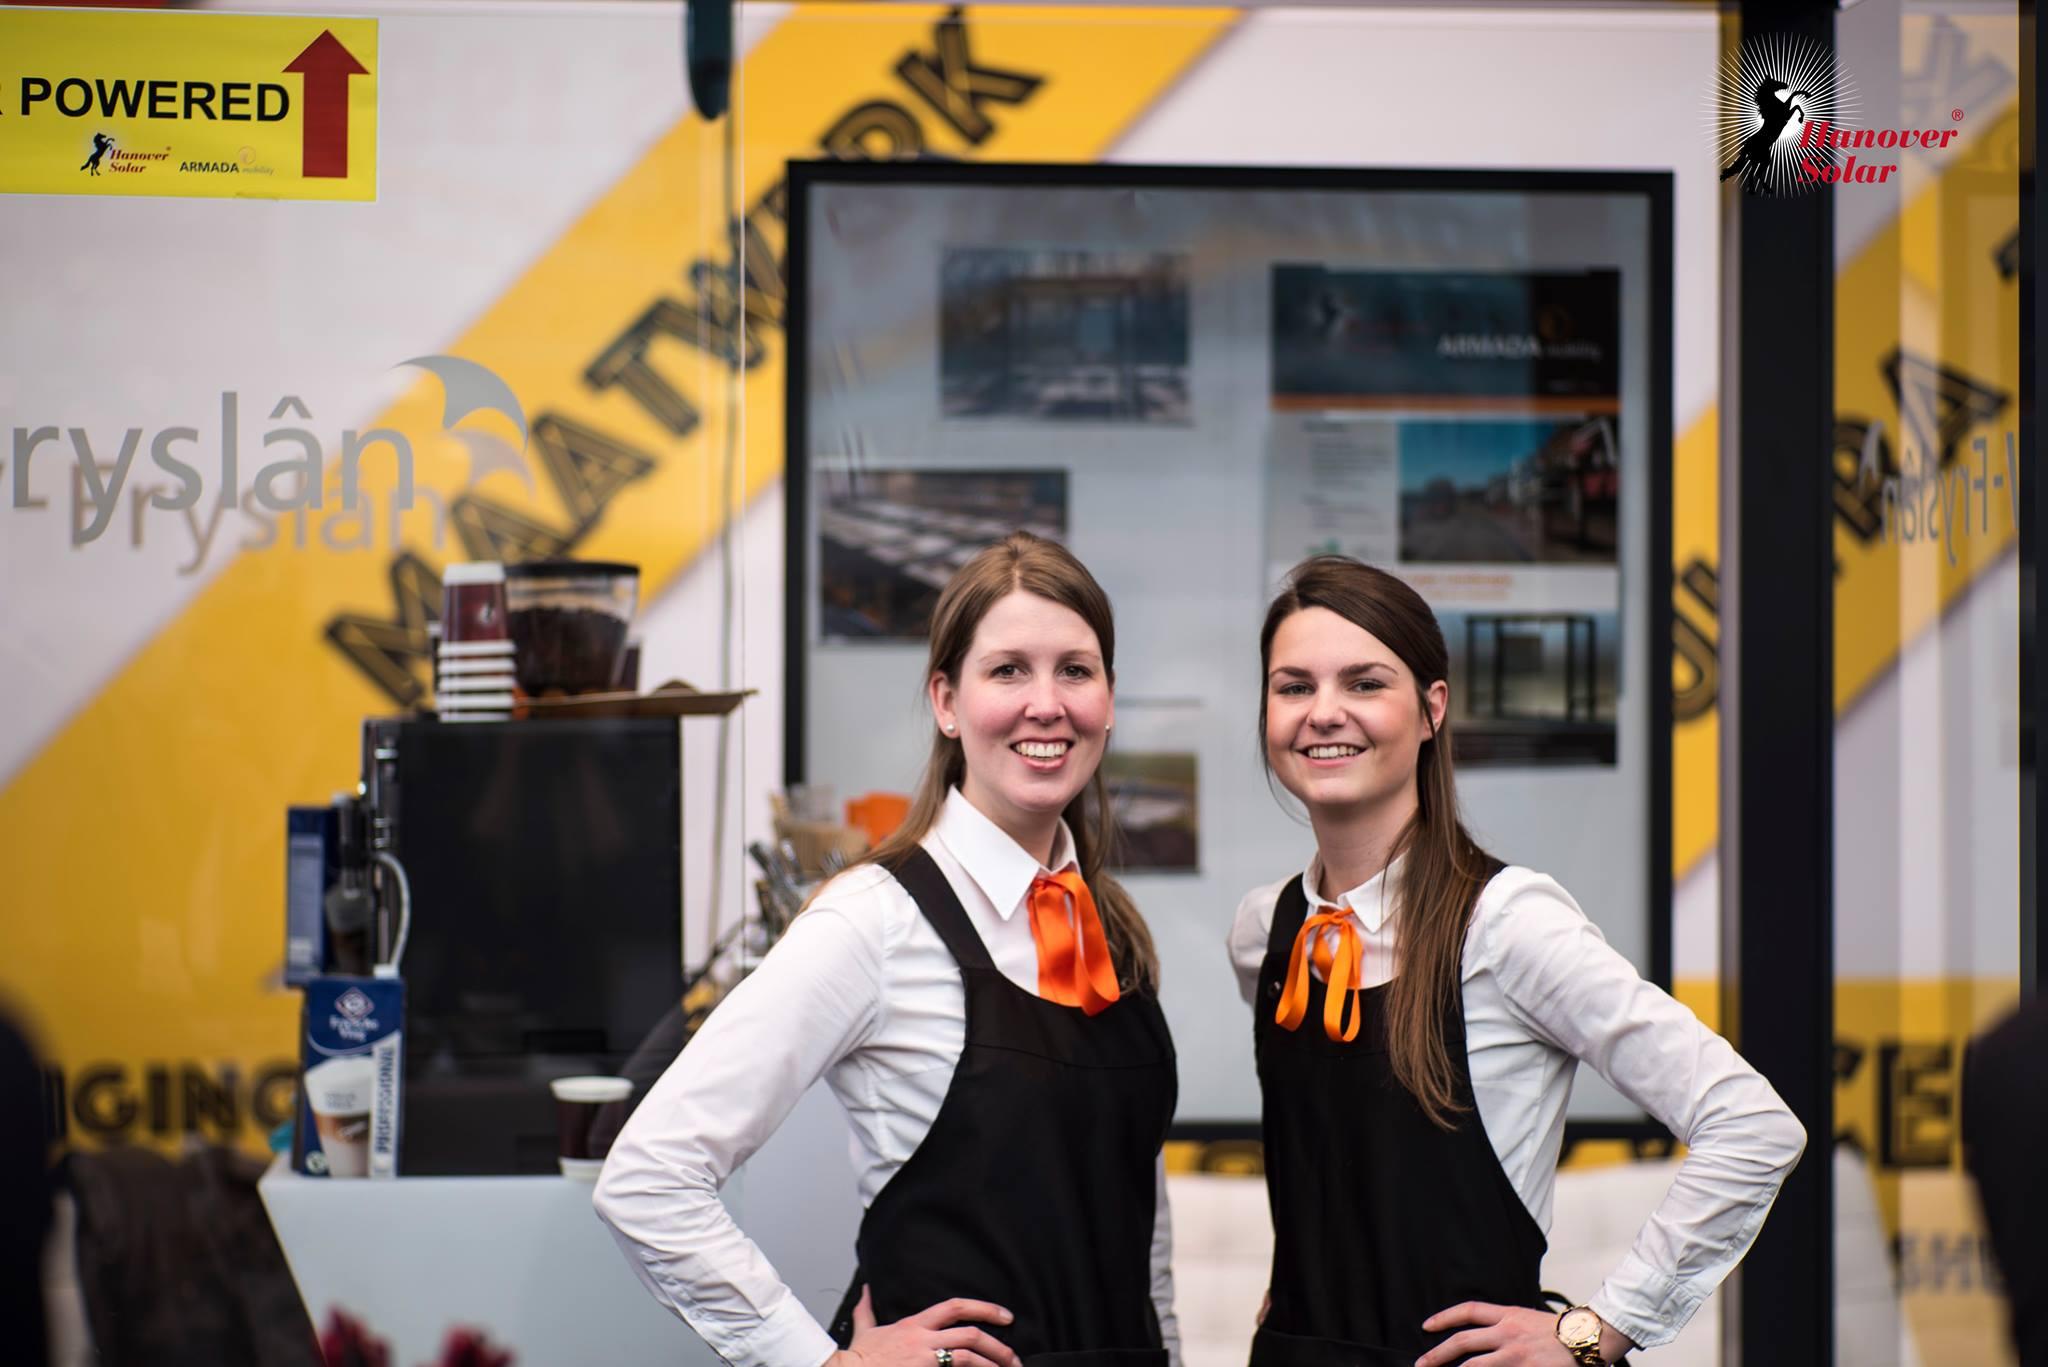 Hanover Solar Beurs Expo Haarlemmermeer